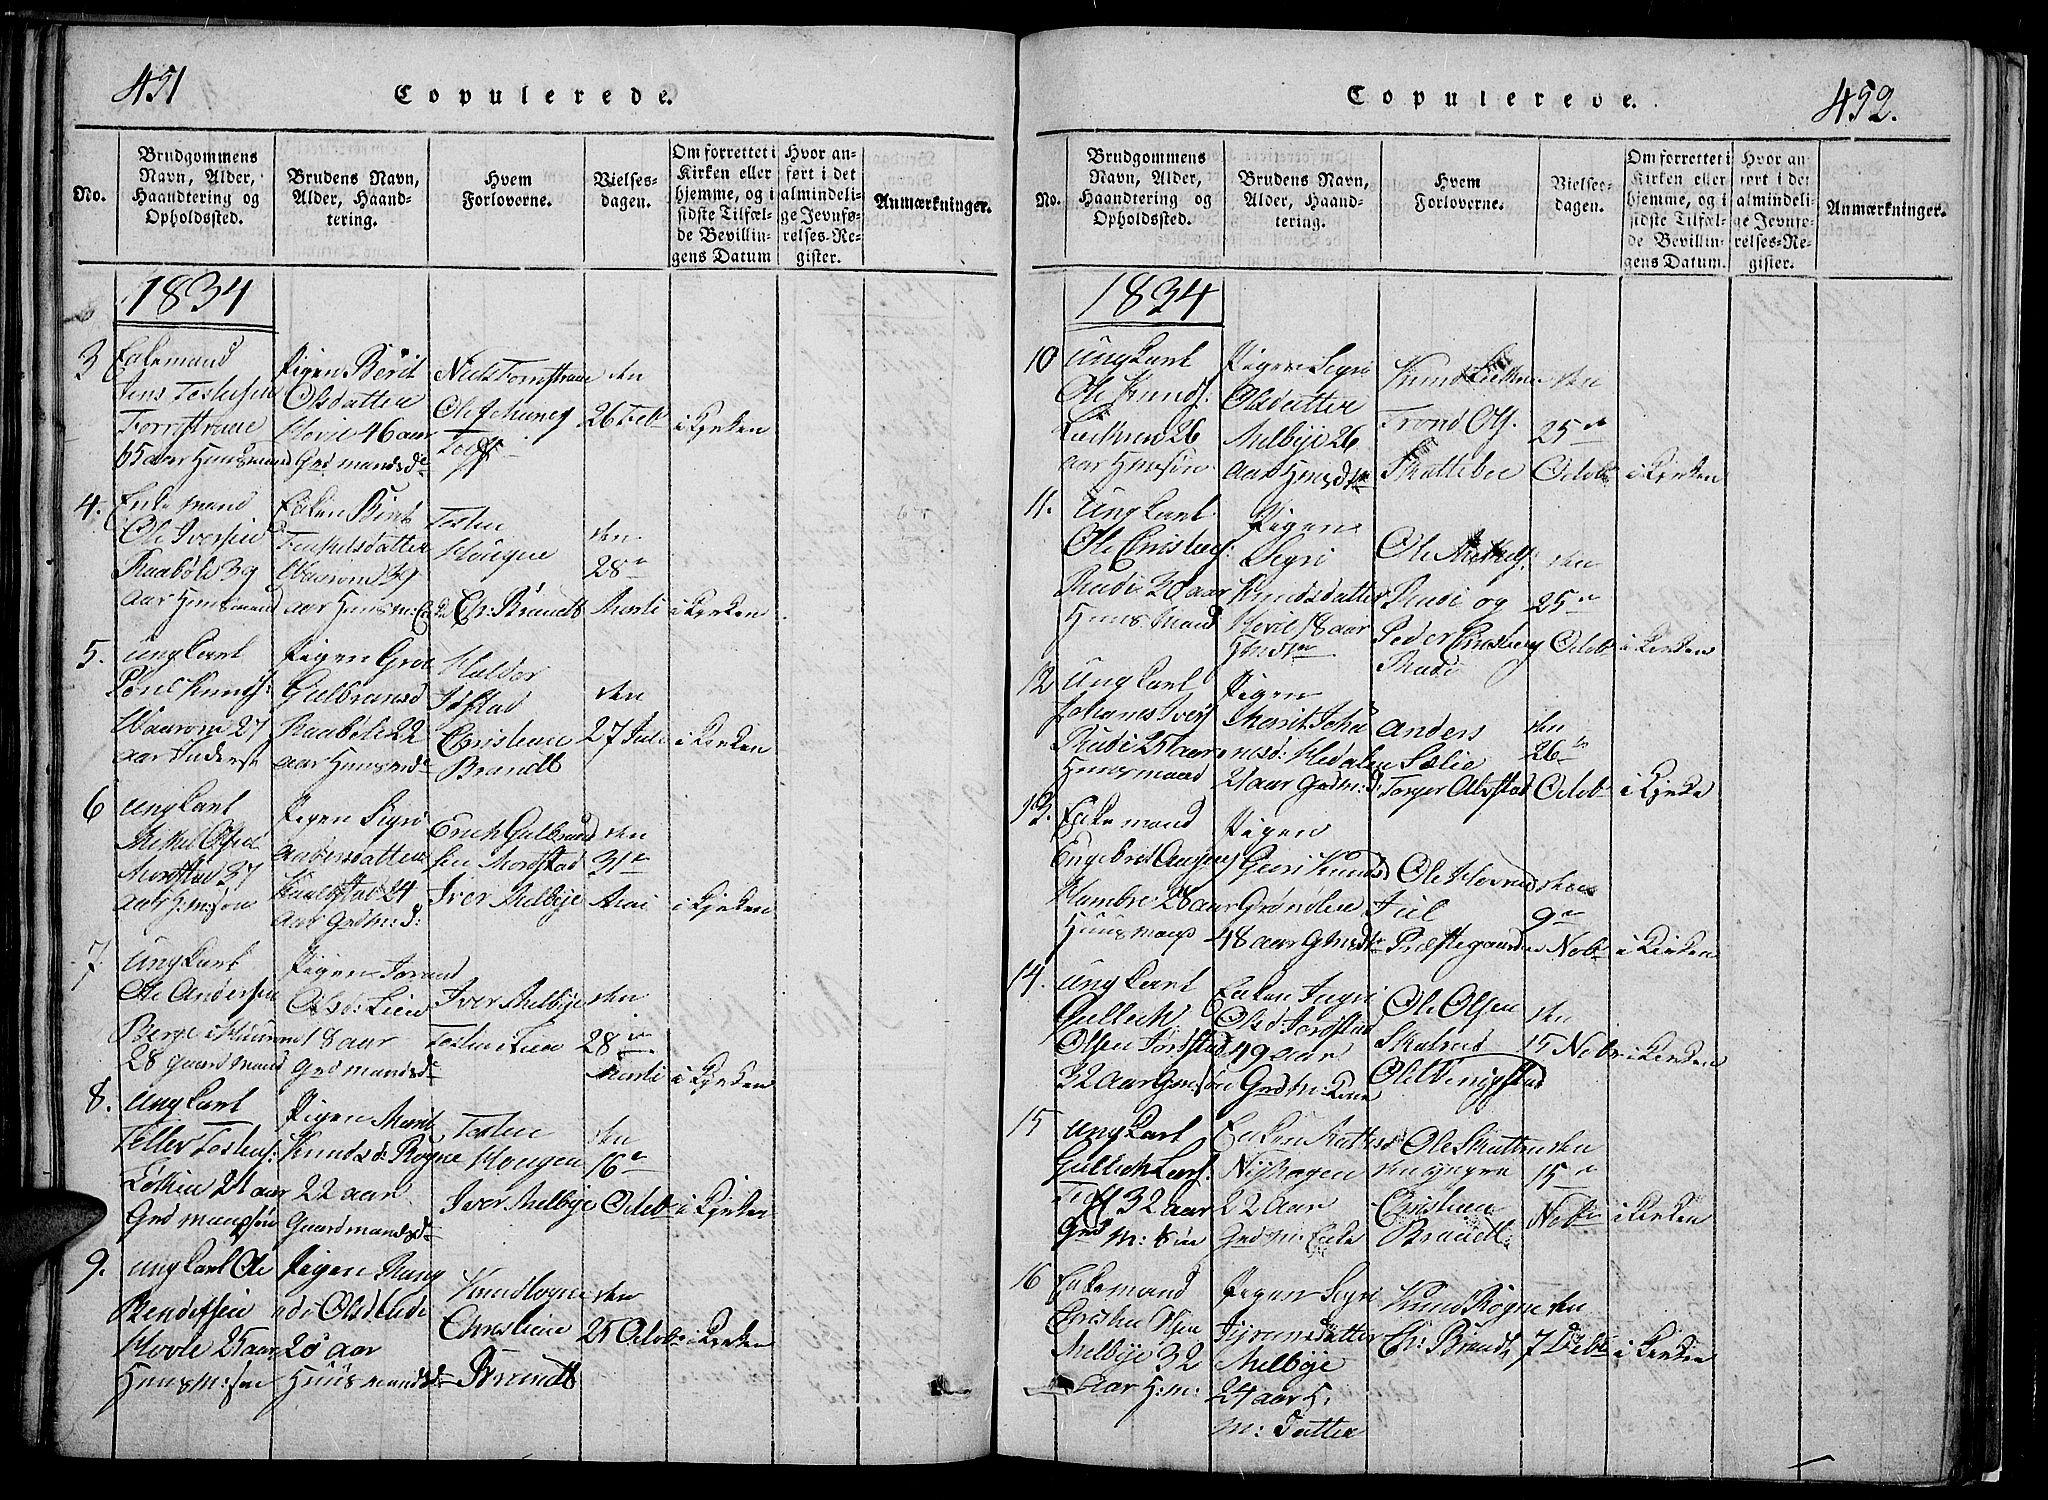 SAH, Slidre prestekontor, Klokkerbok nr. 2, 1814-1839, s. 451-452